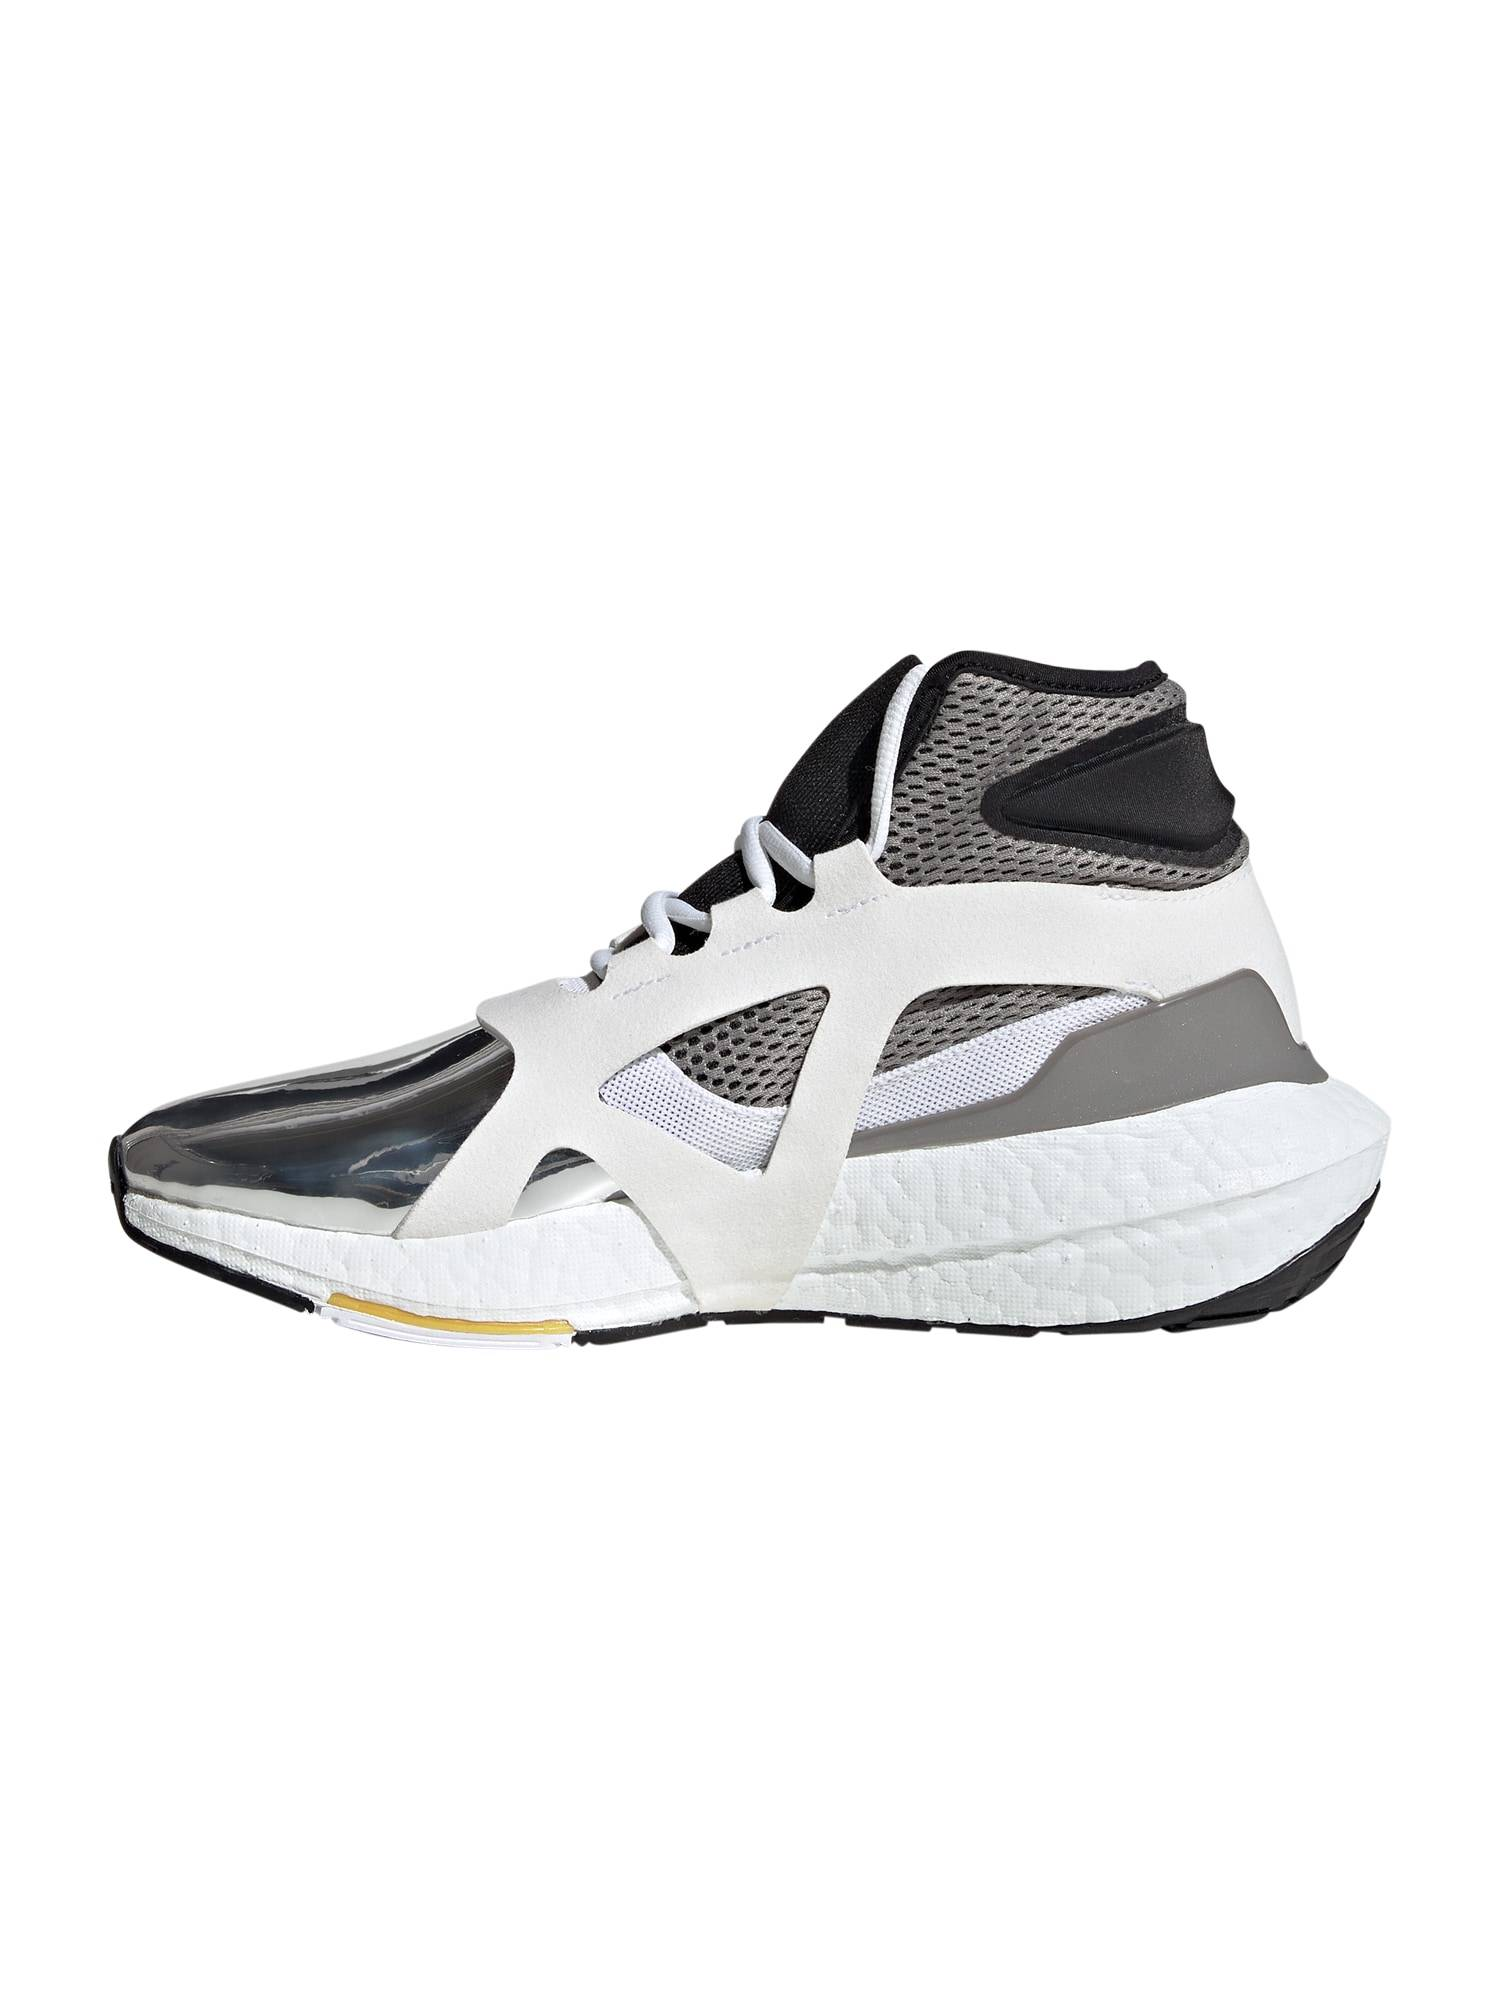 adidas by stella mccartney scarpa sportiva 'asmc ultraboost 21' bianco